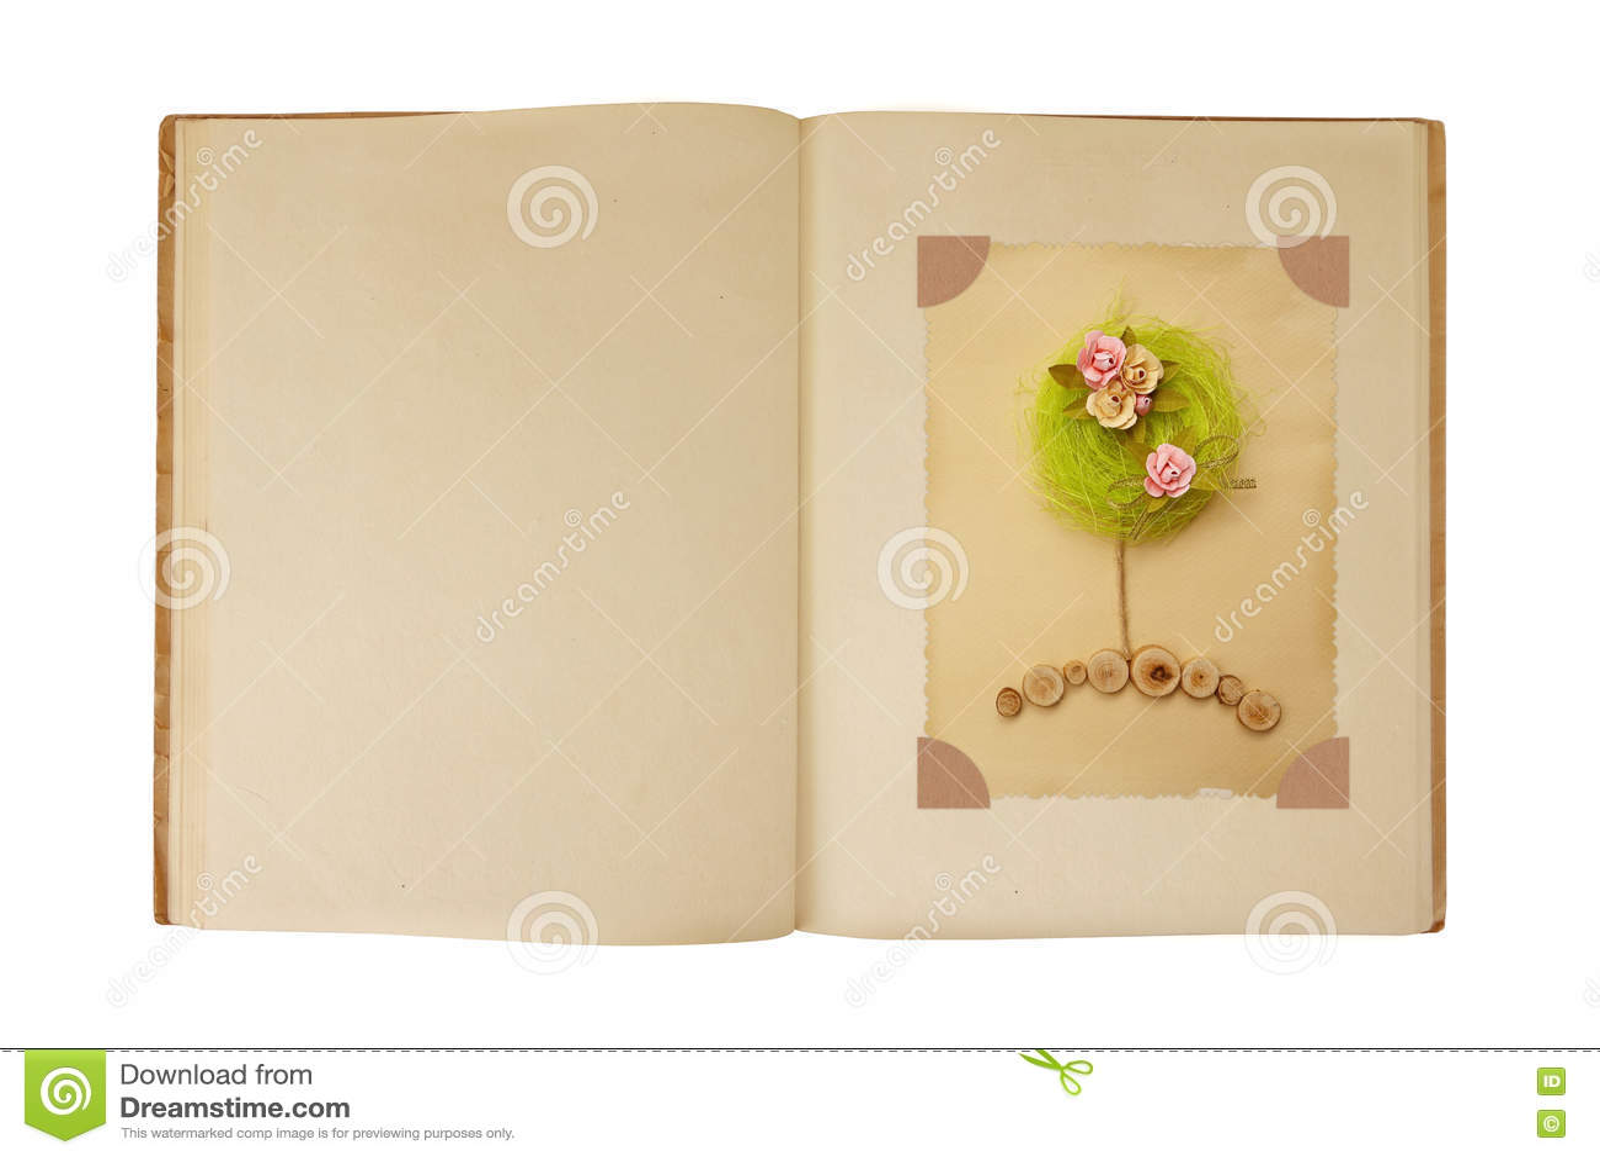 Vintage Book Open With Flower Tree Card Design Inside